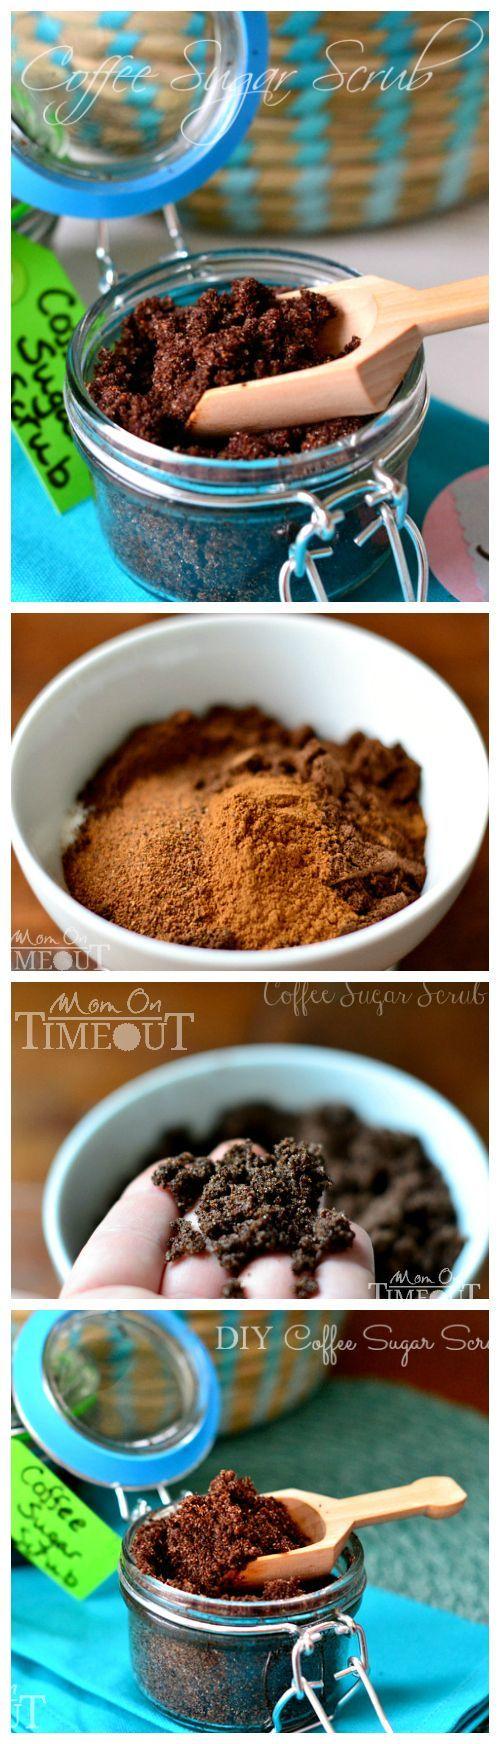 Caffeine in coffee is wonderful for skin!